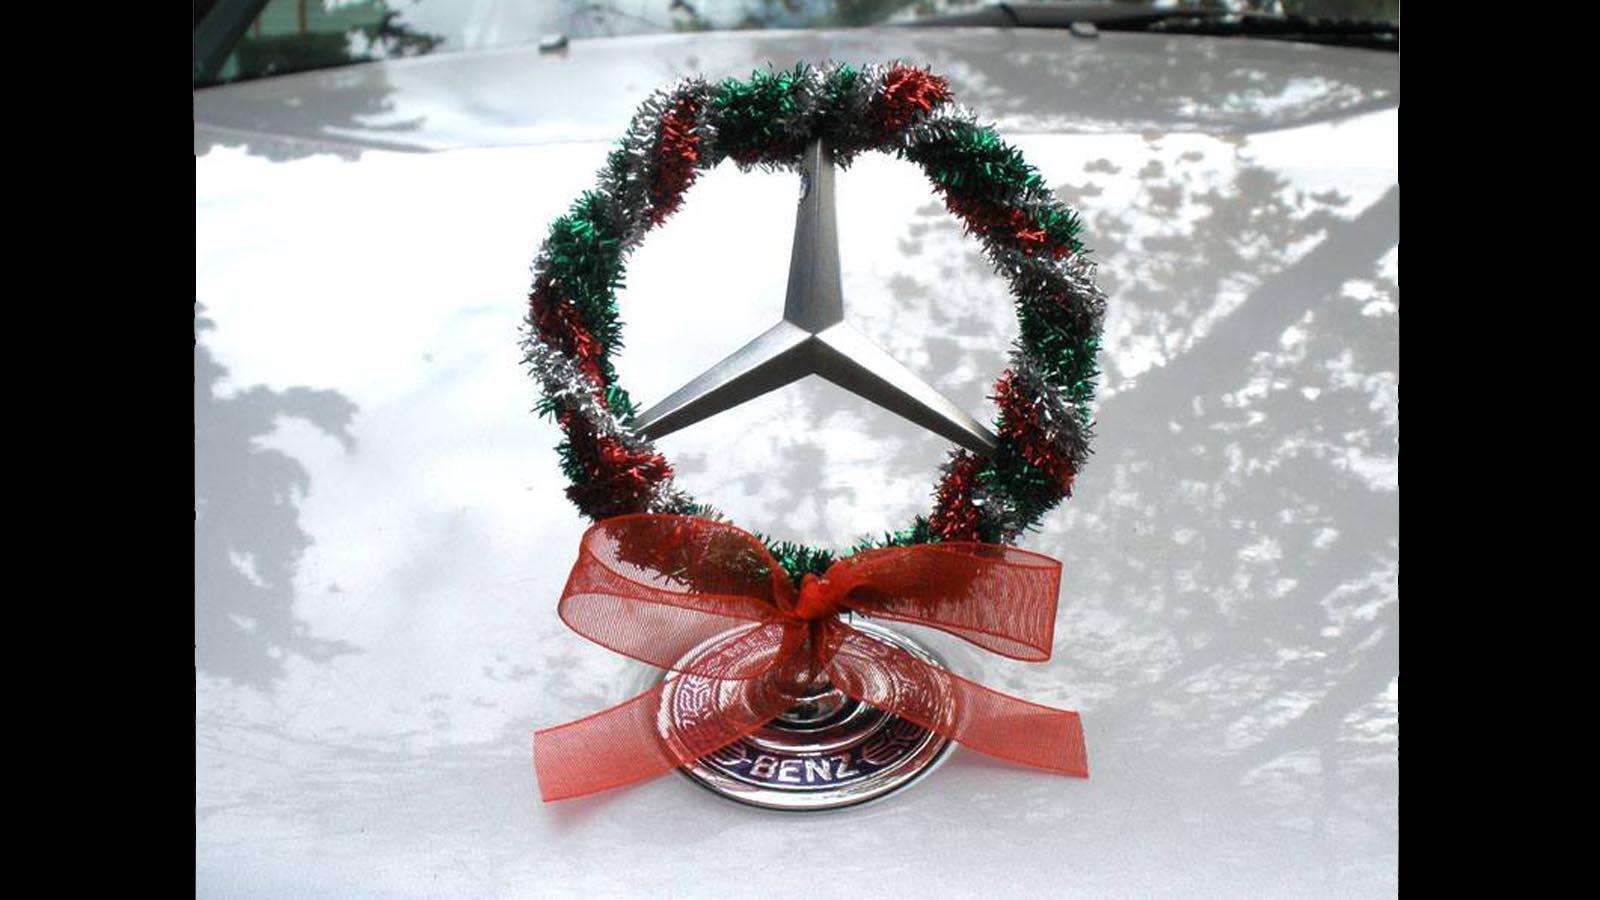 Mercedes-Benz Emblem Wreath